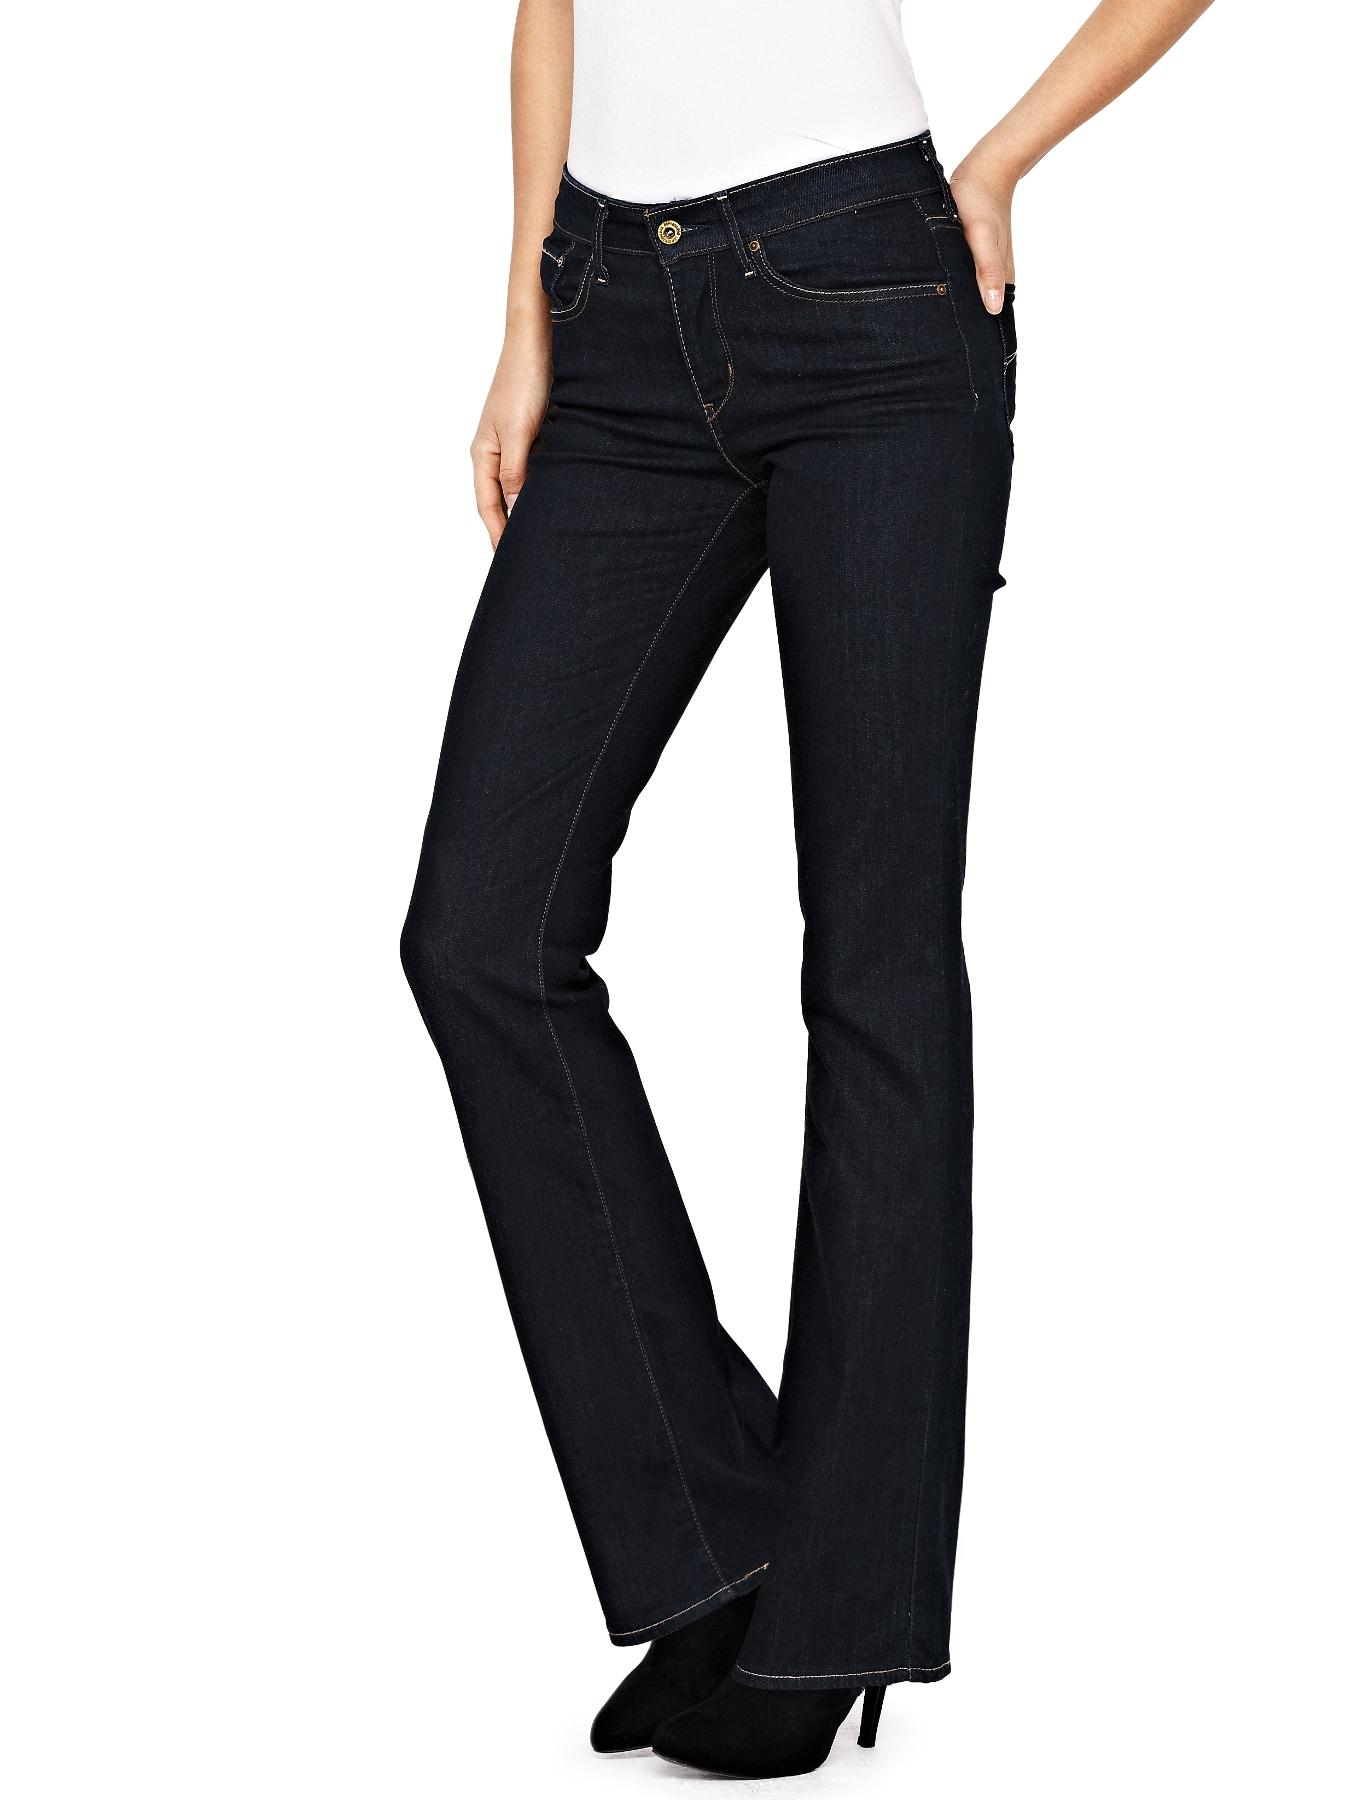 Demi Curve Bootcut Jeans - Richest Indigo, Indigo